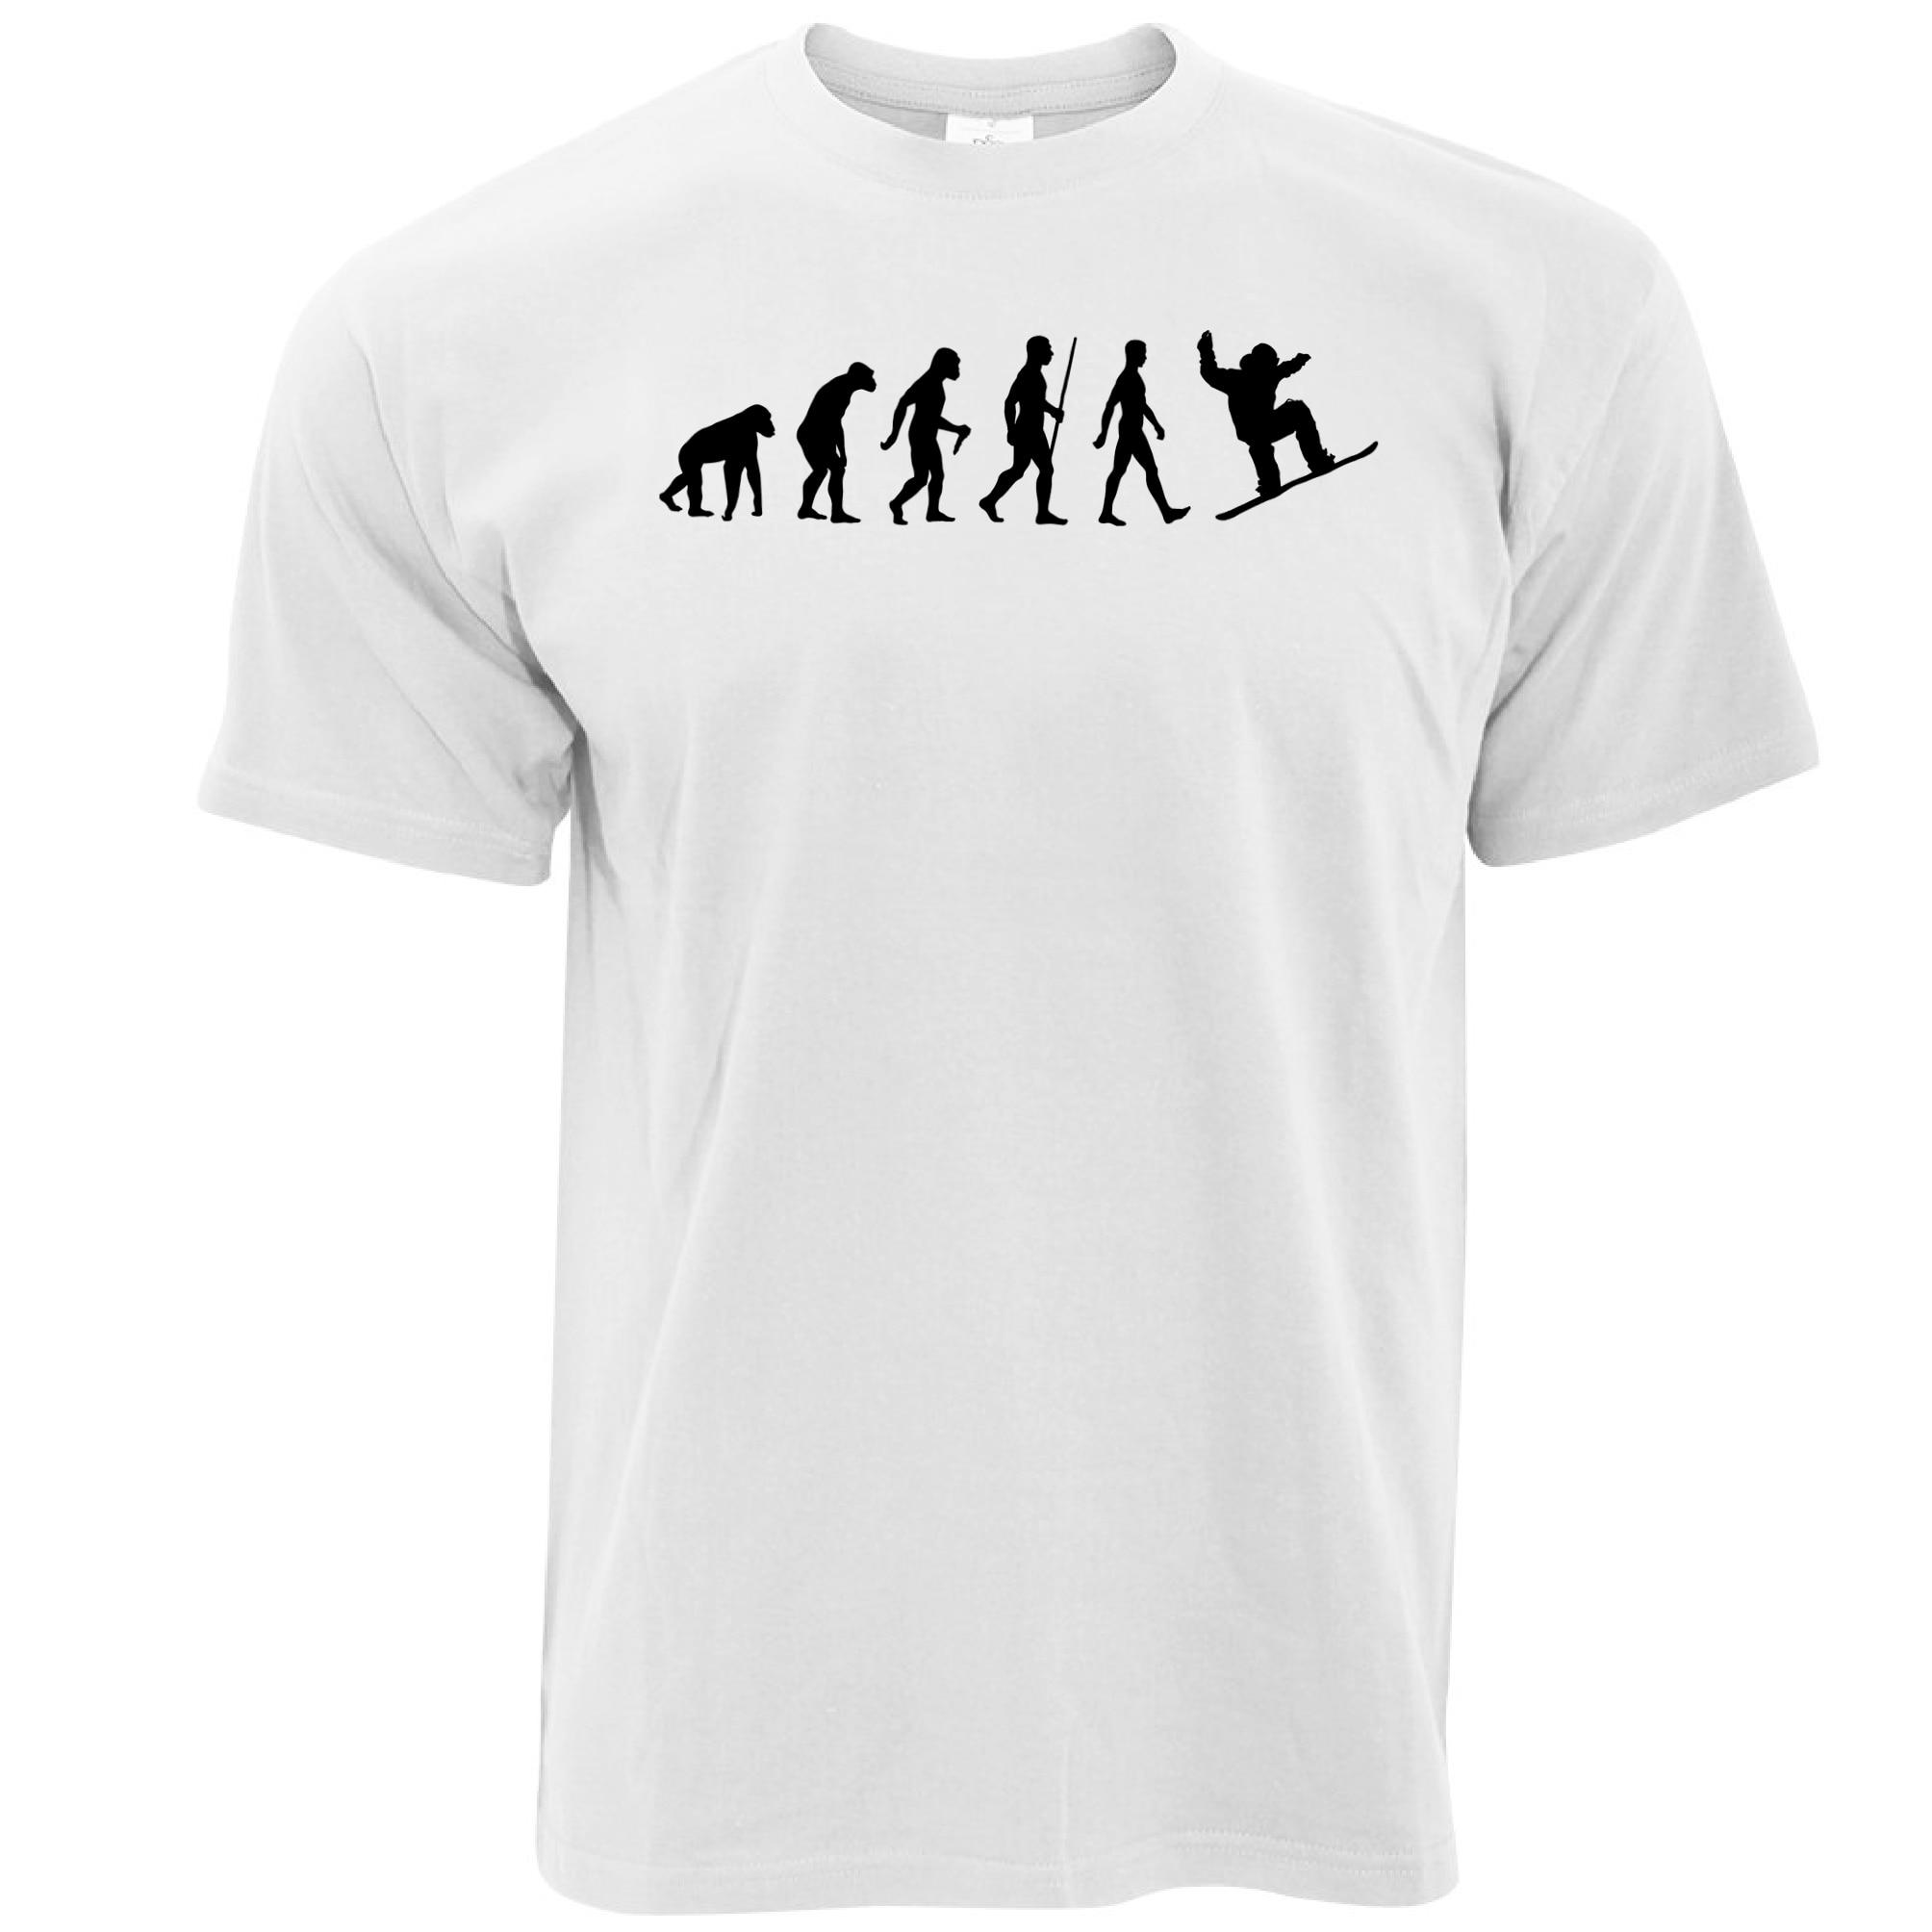 T Shirt Shop Crew Neck Short-Sleeve Fashion 2017 Mens Evolution Of Snowboardinger Snow Mountain Tricks Flip Country Tee Shirts